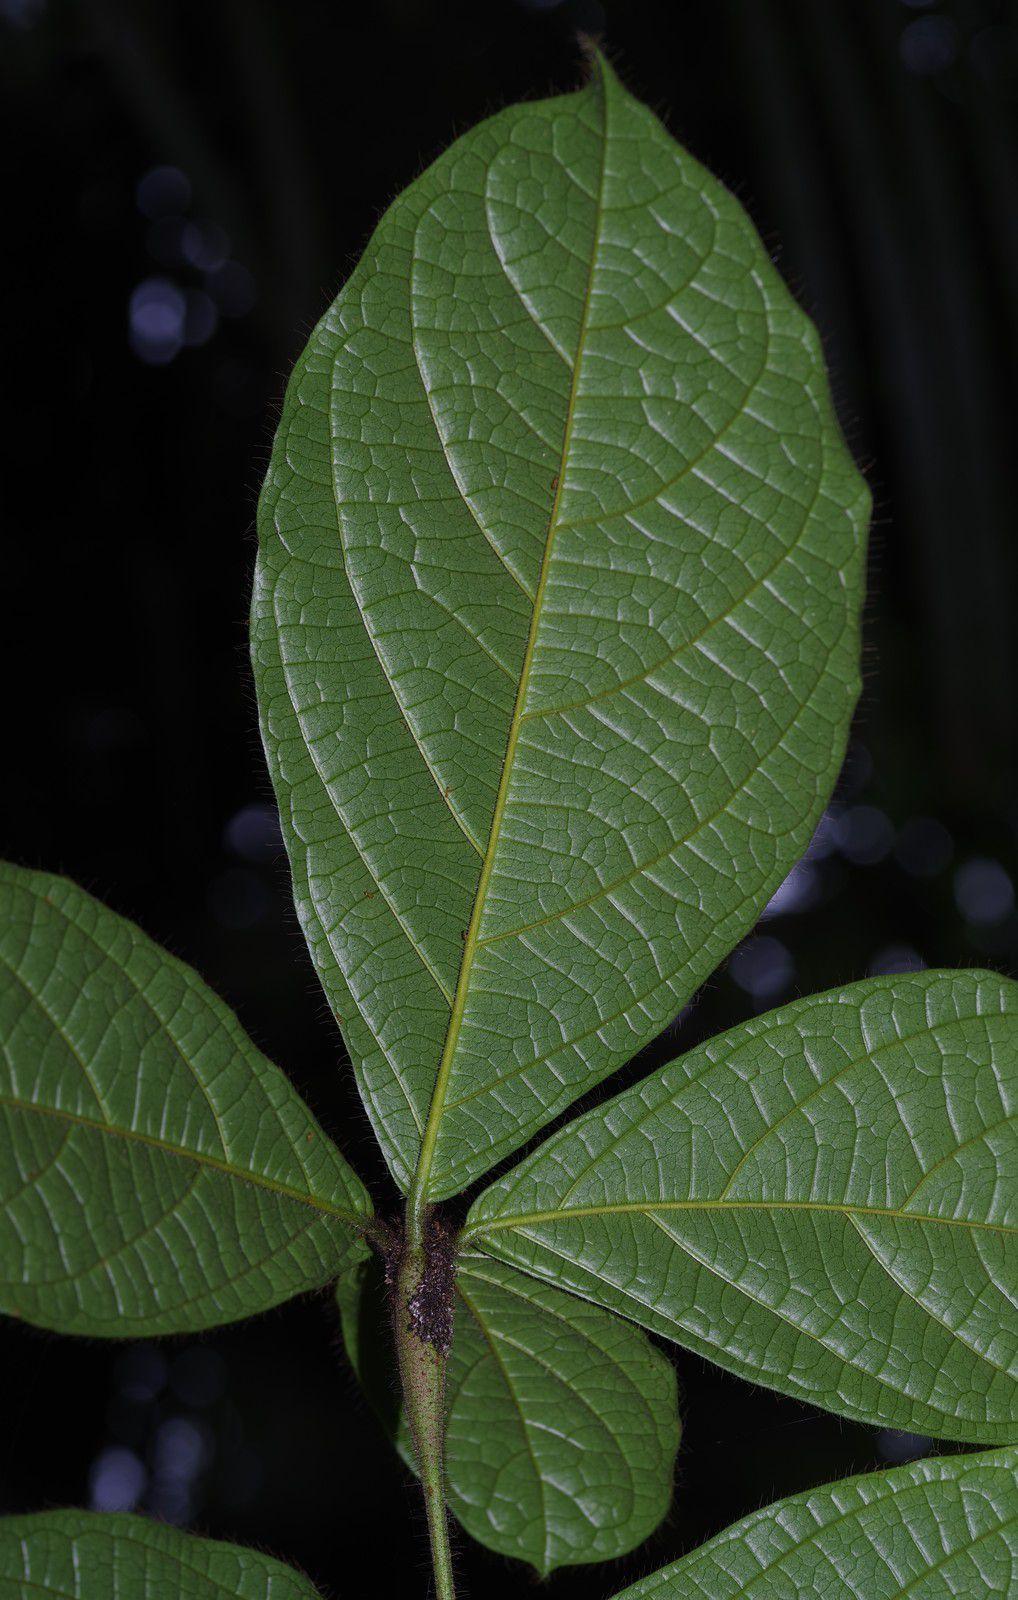 Cordia nodosa (lamoussé fourmi, bois fourmi)